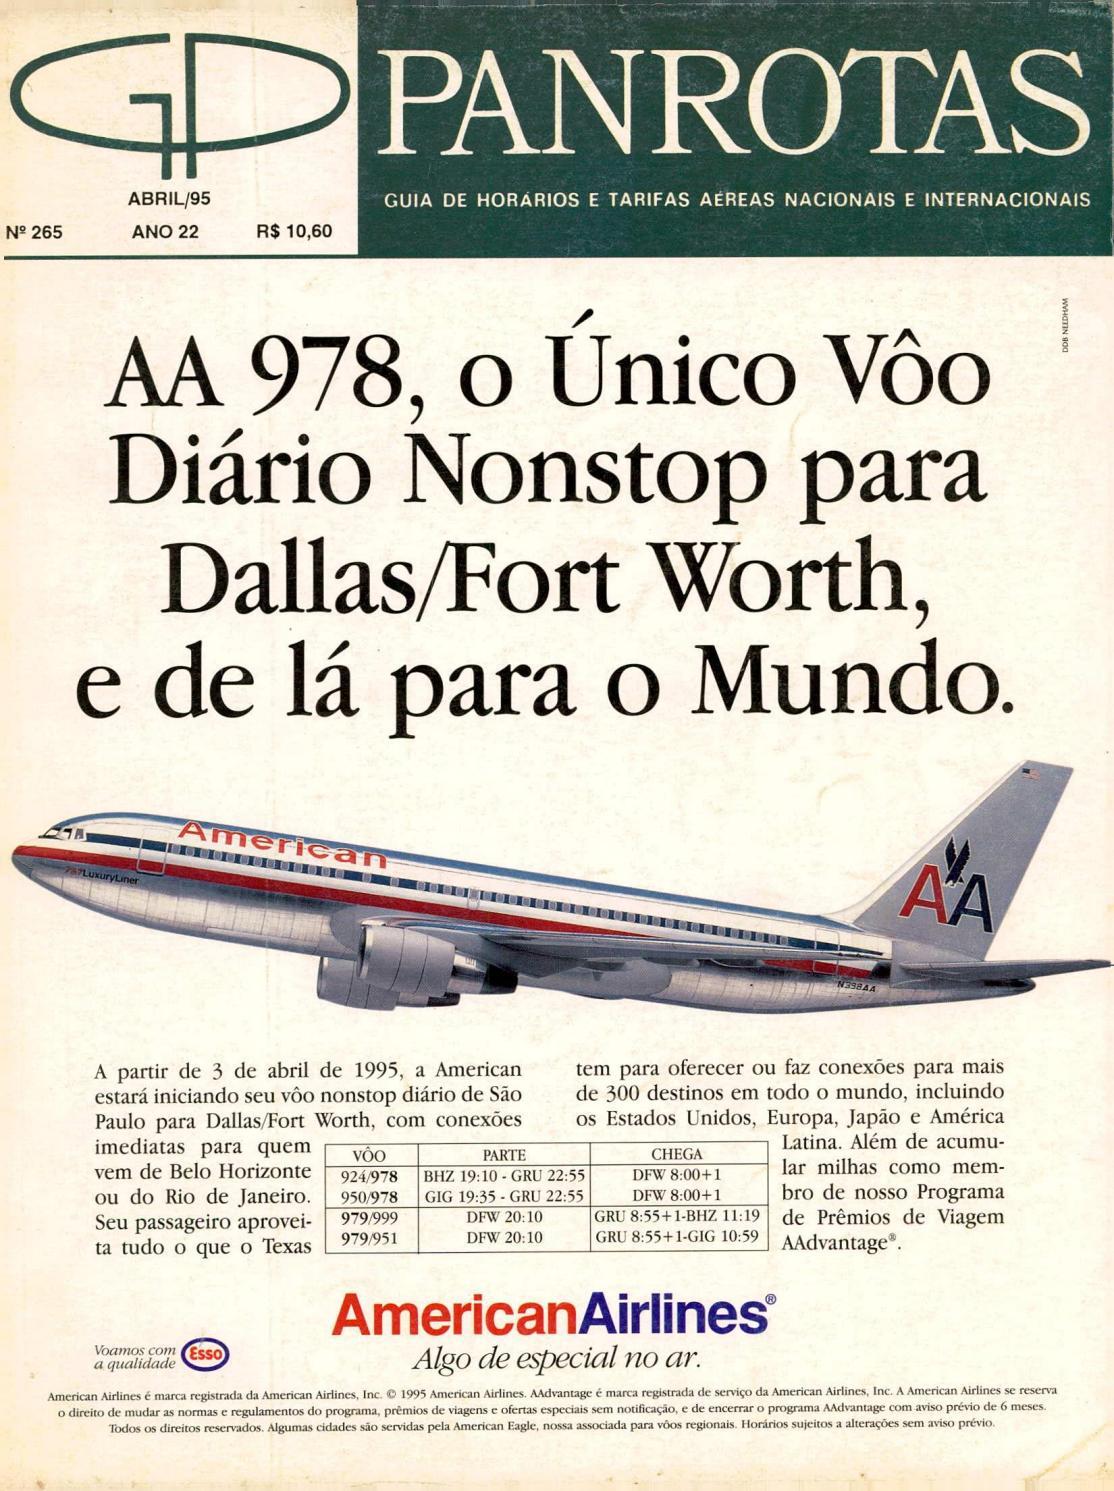 a924651460f94 Guia PANROTAS - Edição 265 - Abril 1995 by PANROTAS Editora - issuu